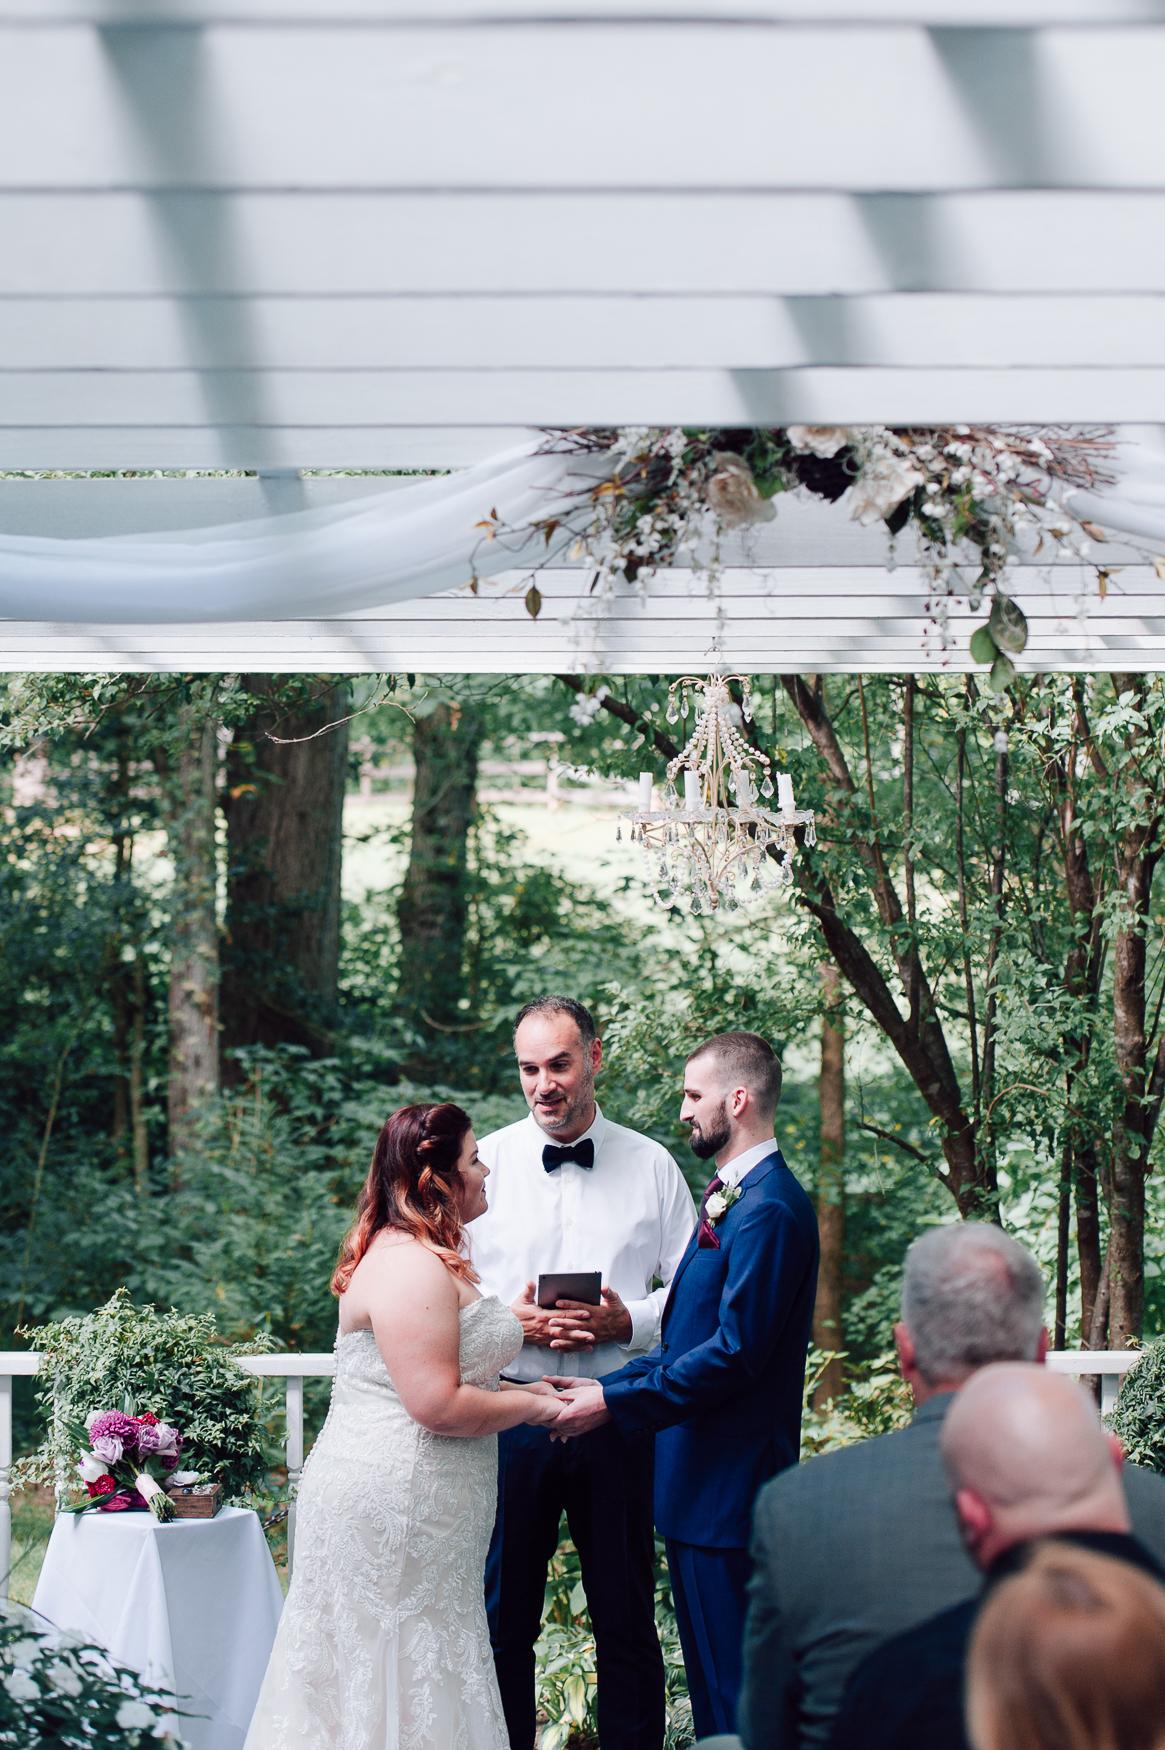 virginiawedding_GlenGarden_rusticwedding_fredericksburg_youseephotography_KellySteven (34).jpg